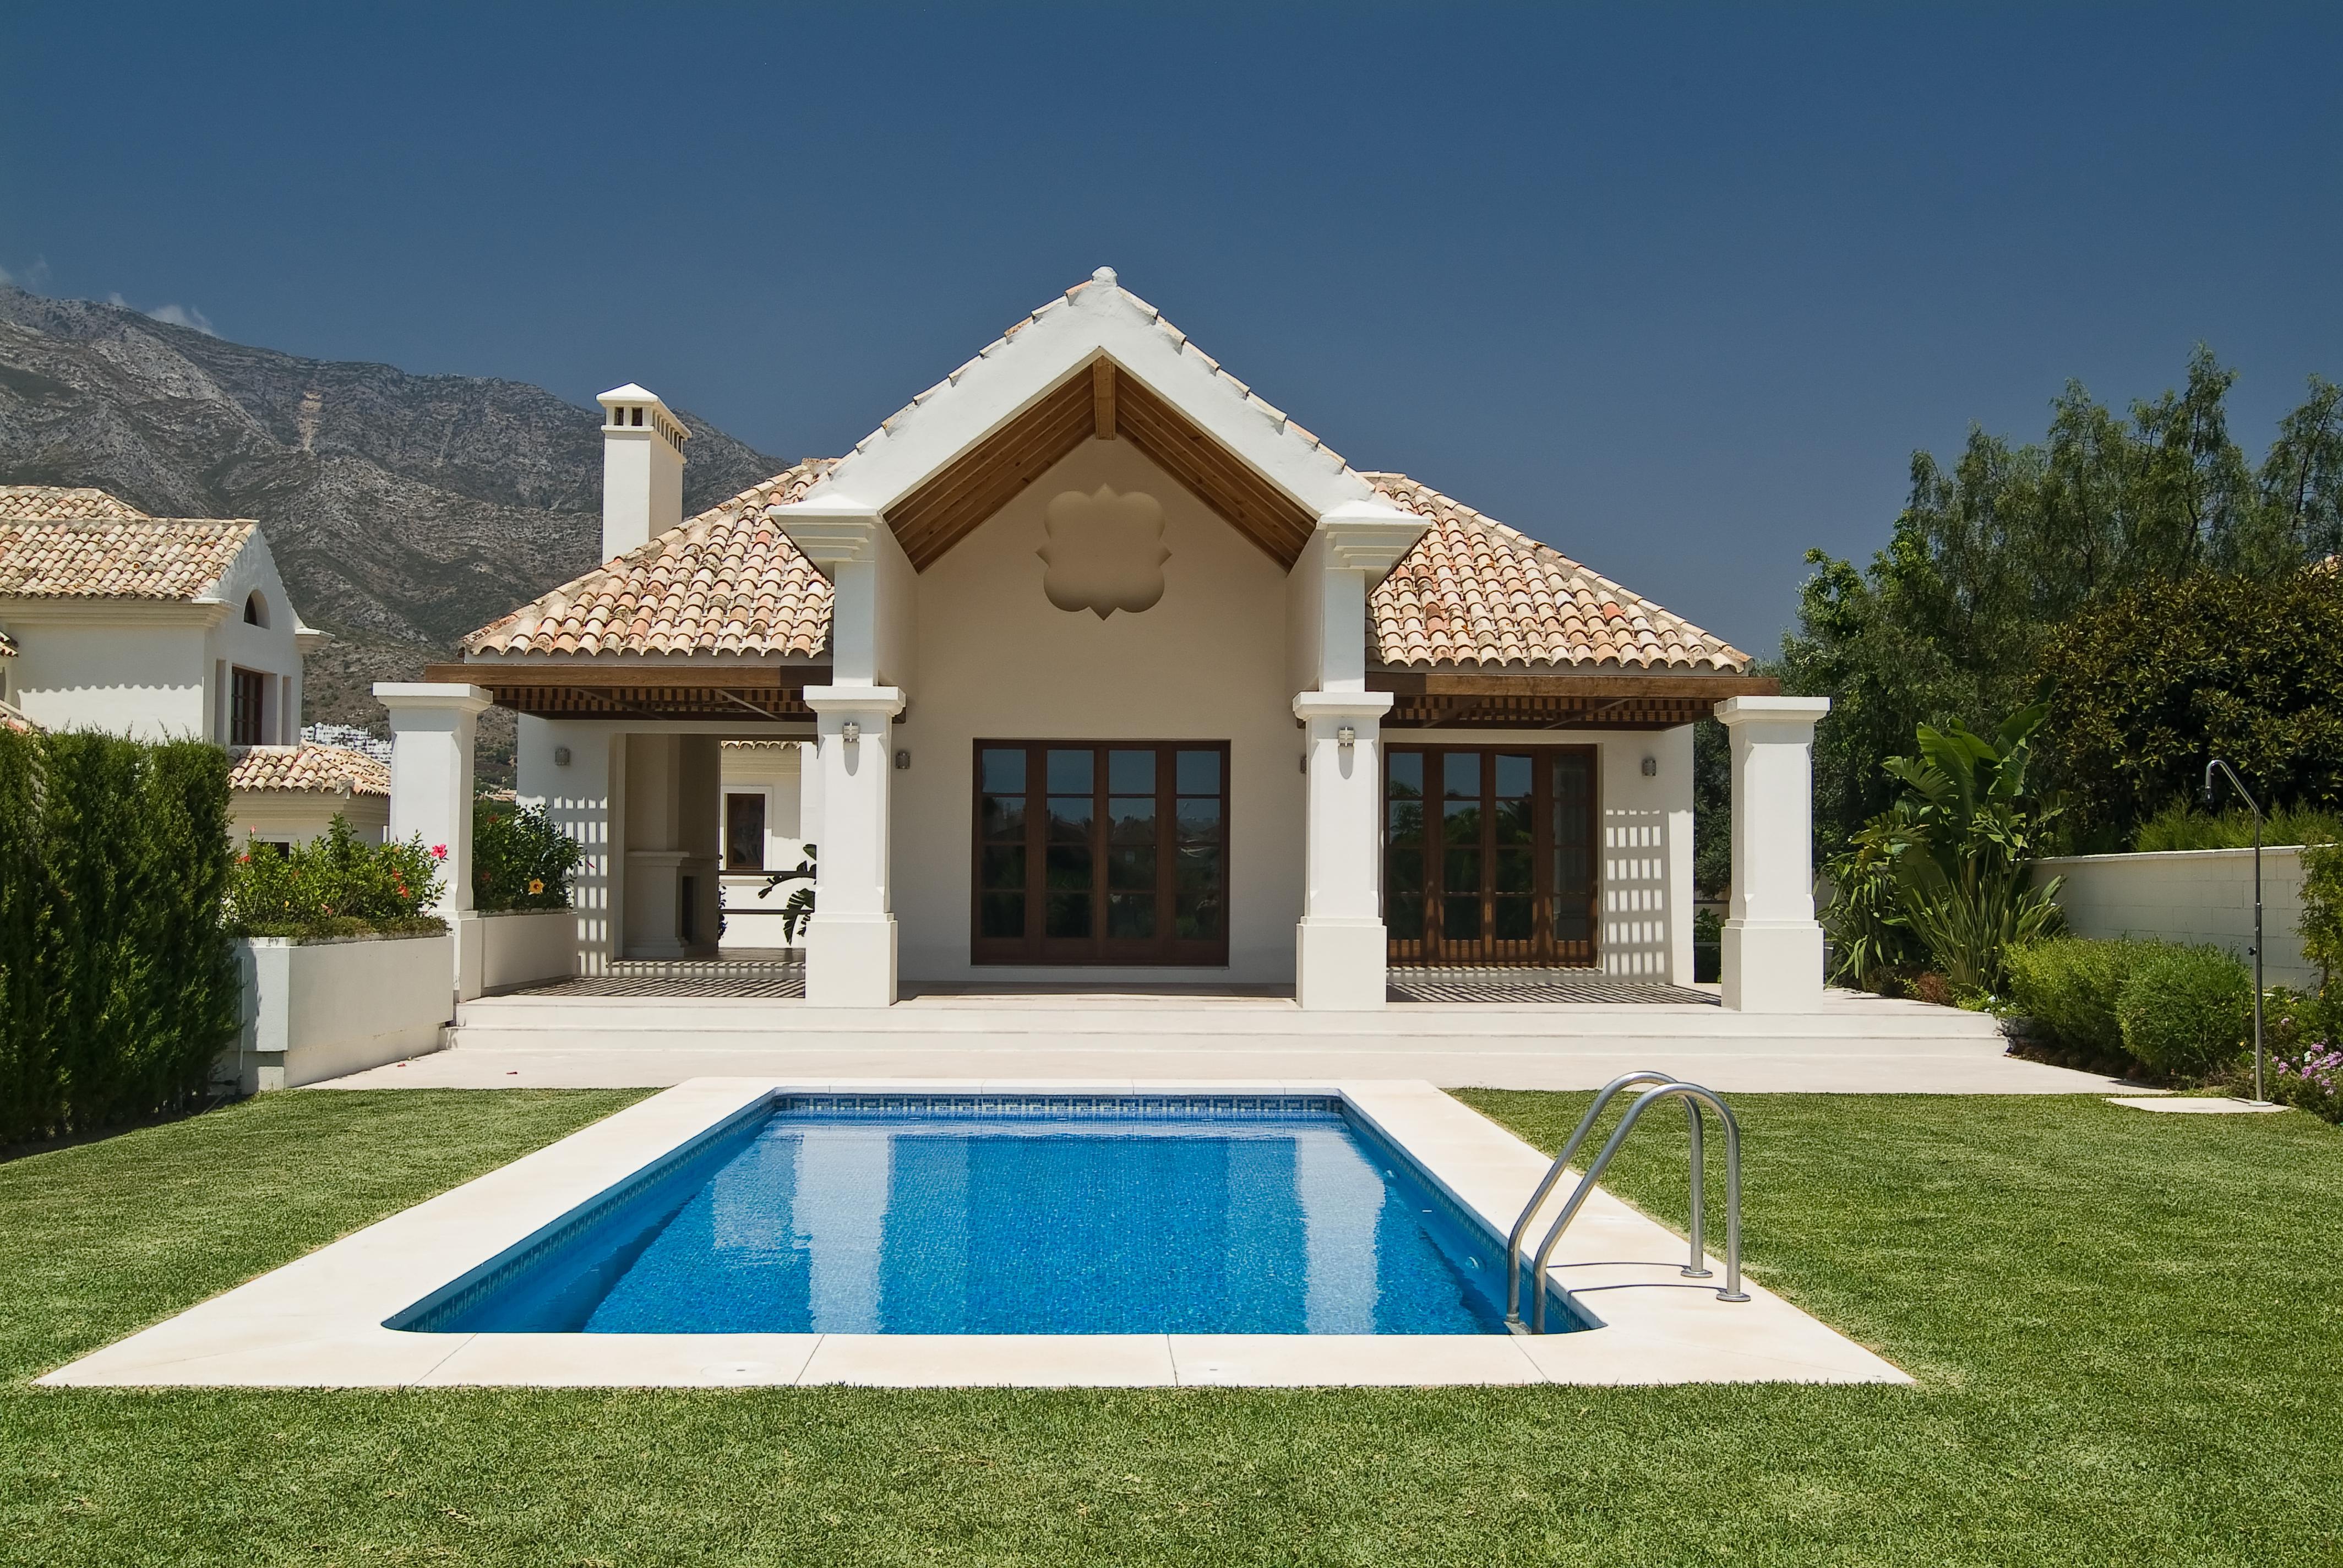 6 bedrooms villa traditional arquitecture & modern design